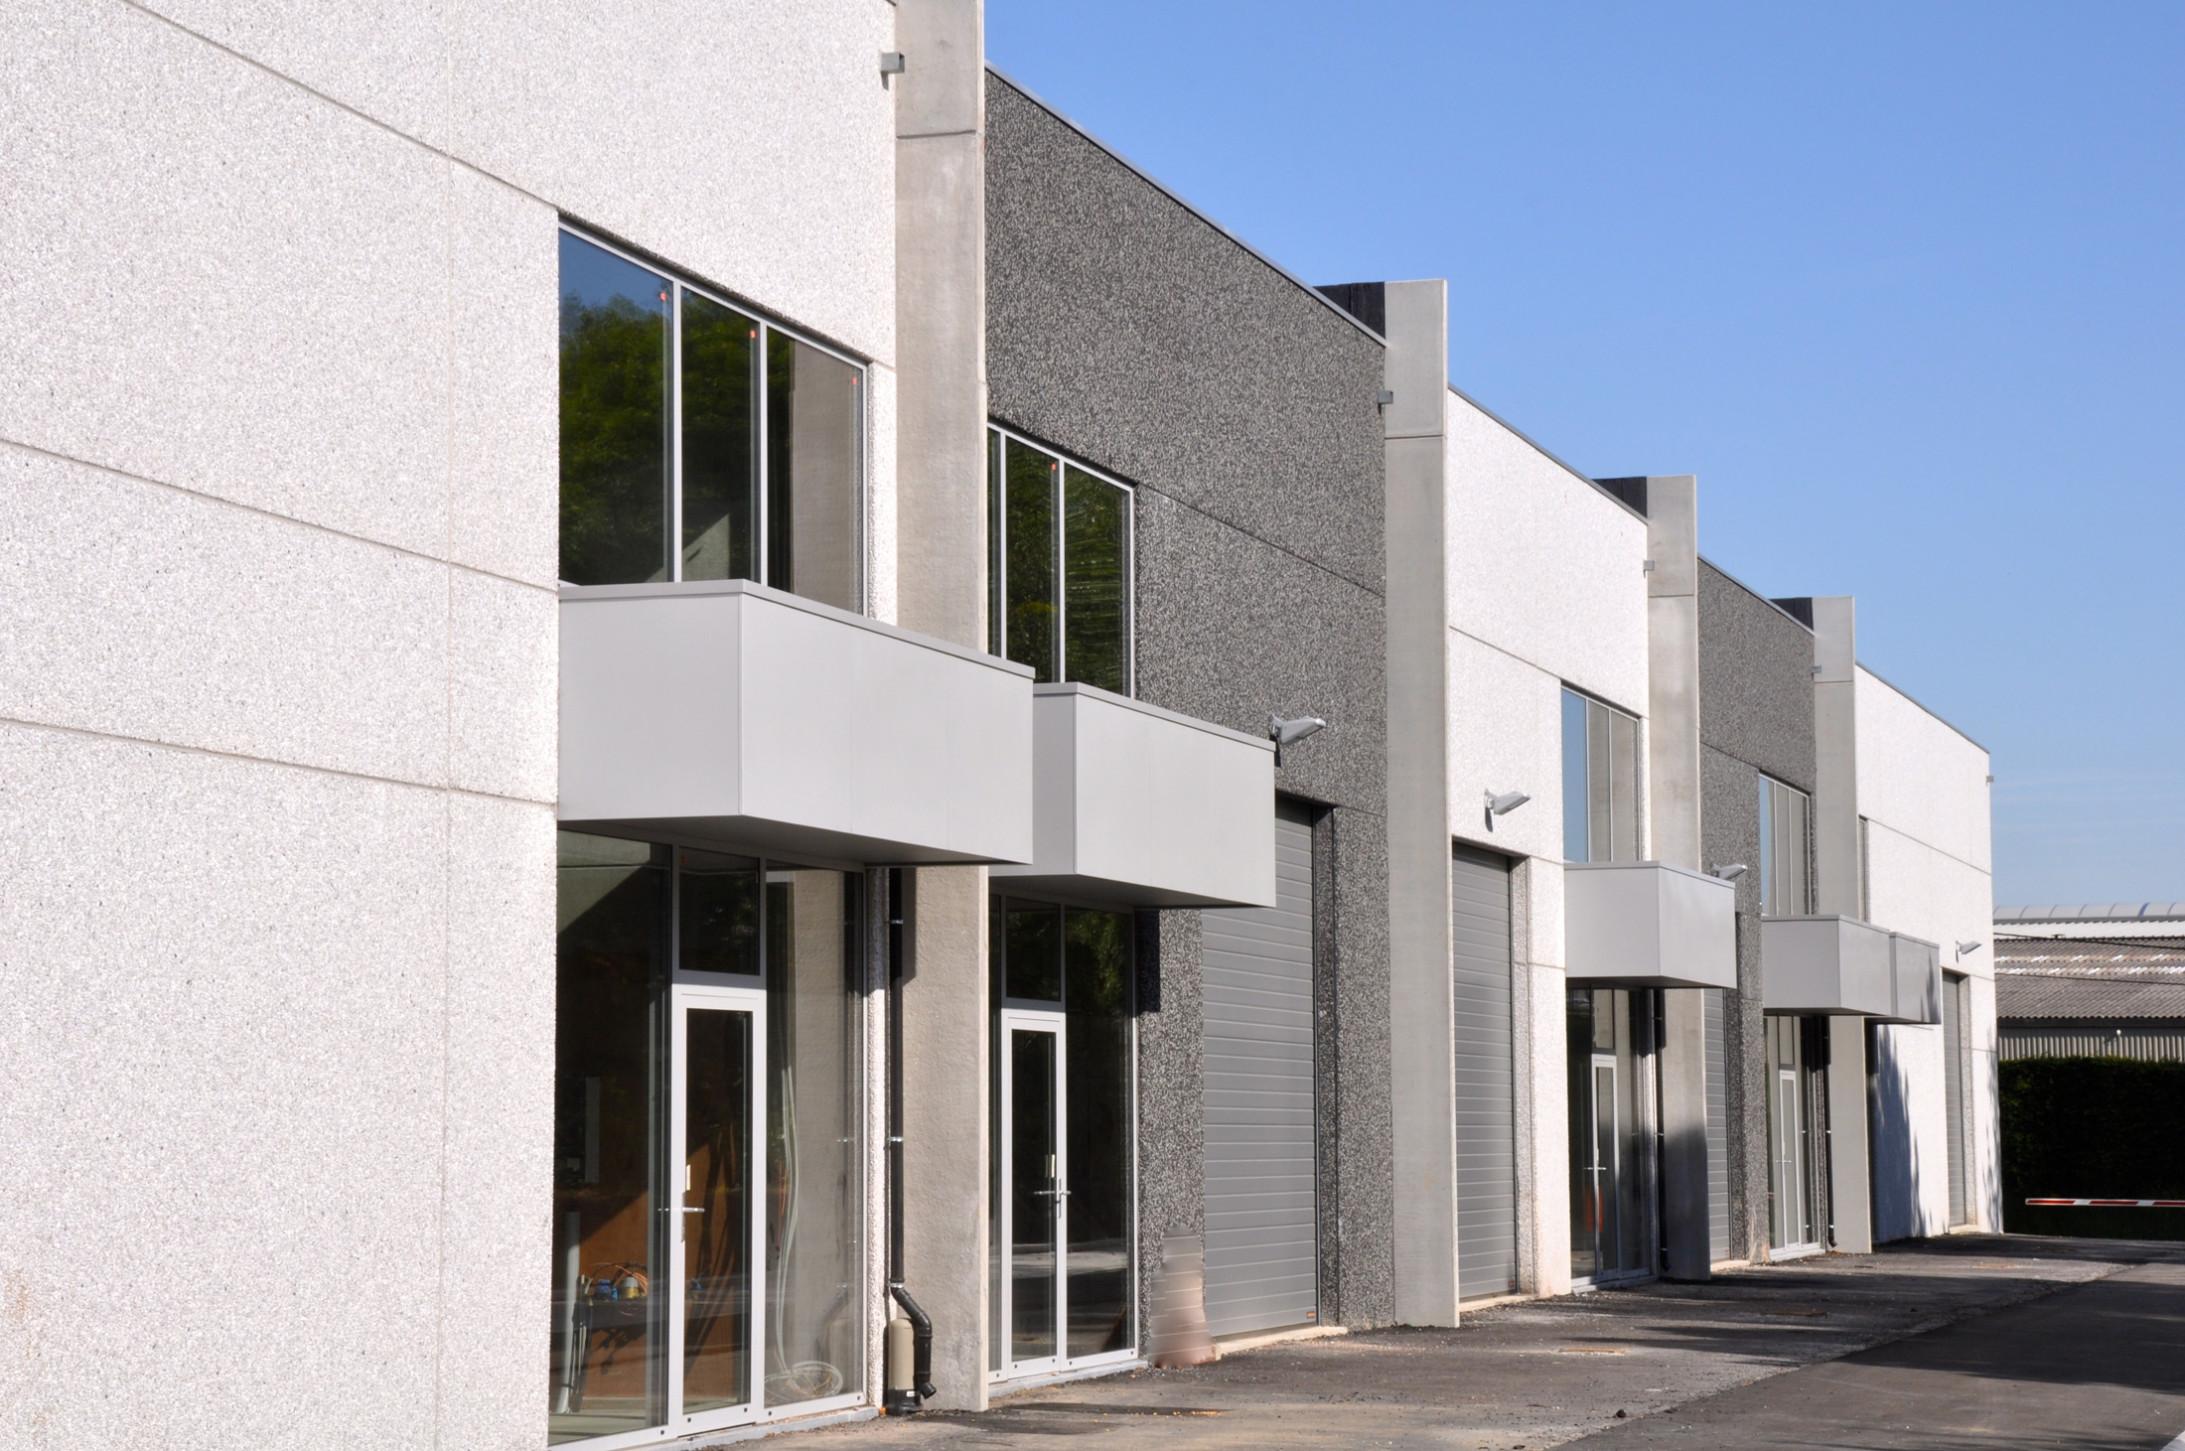 Bedrijfsverzamelgebouwen1_Roeselare_Claeys Architecten.jpg